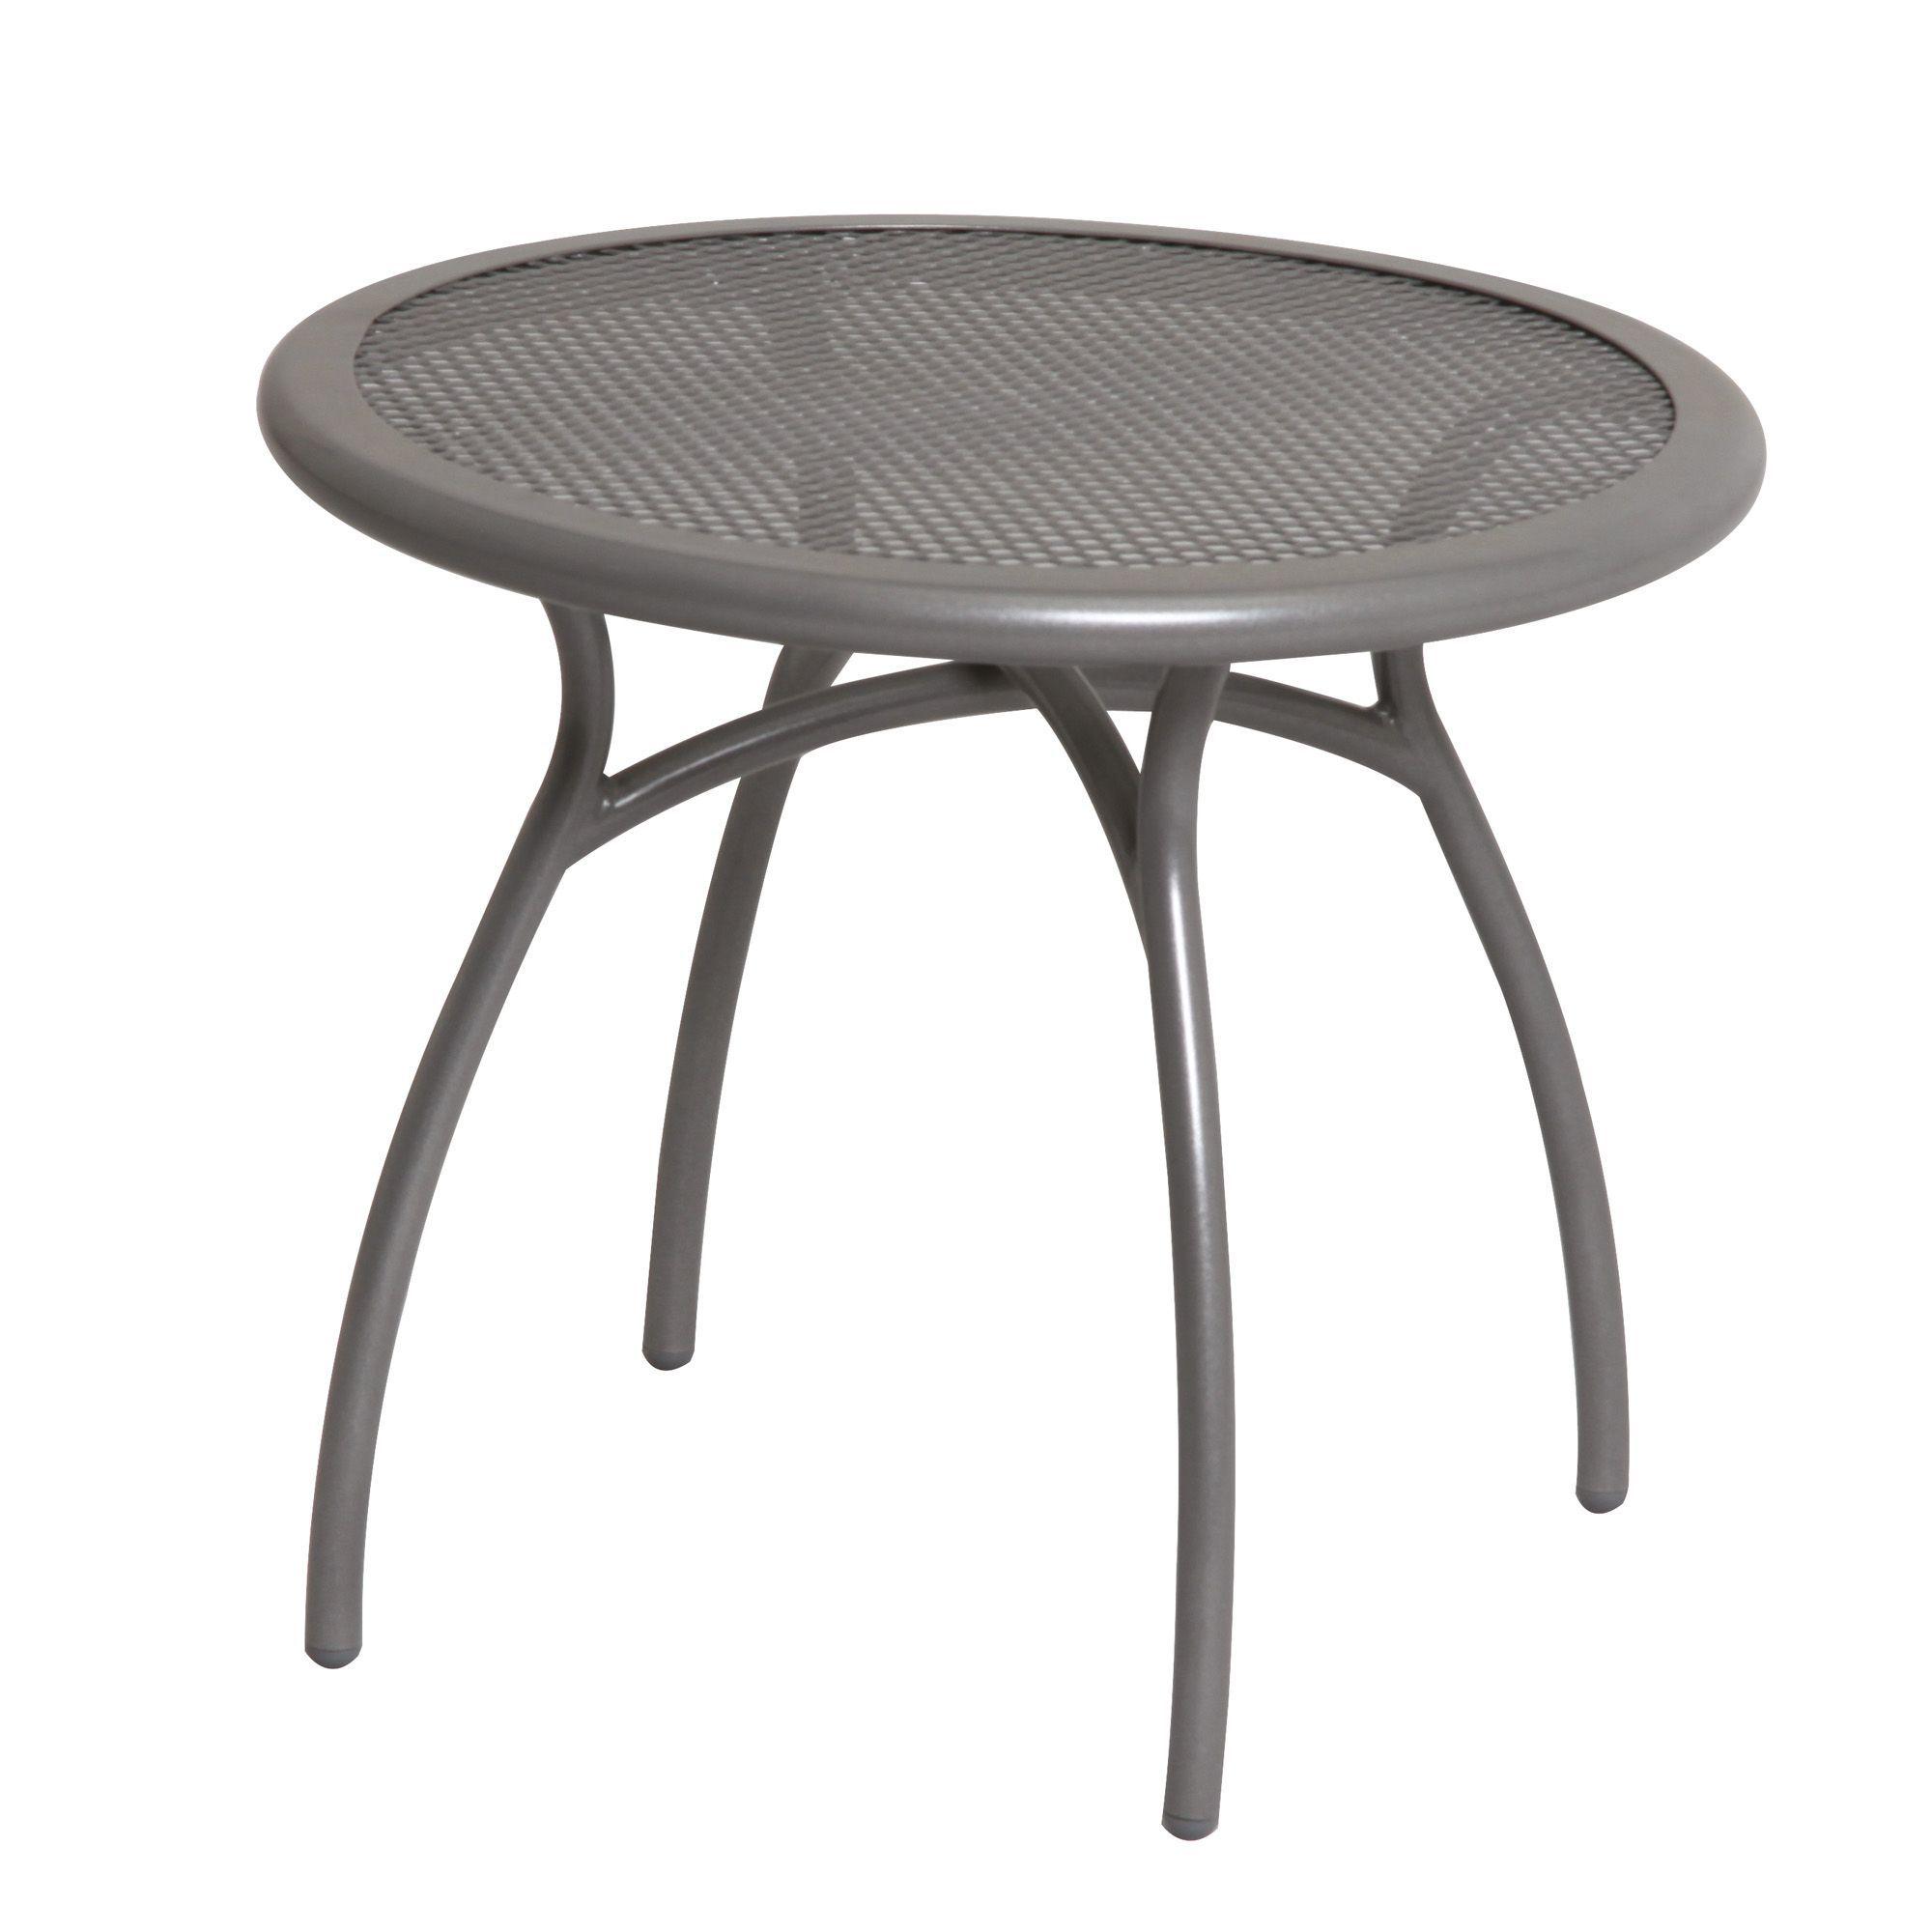 Coburg metal side table departments diy at b q for Diy metal end table